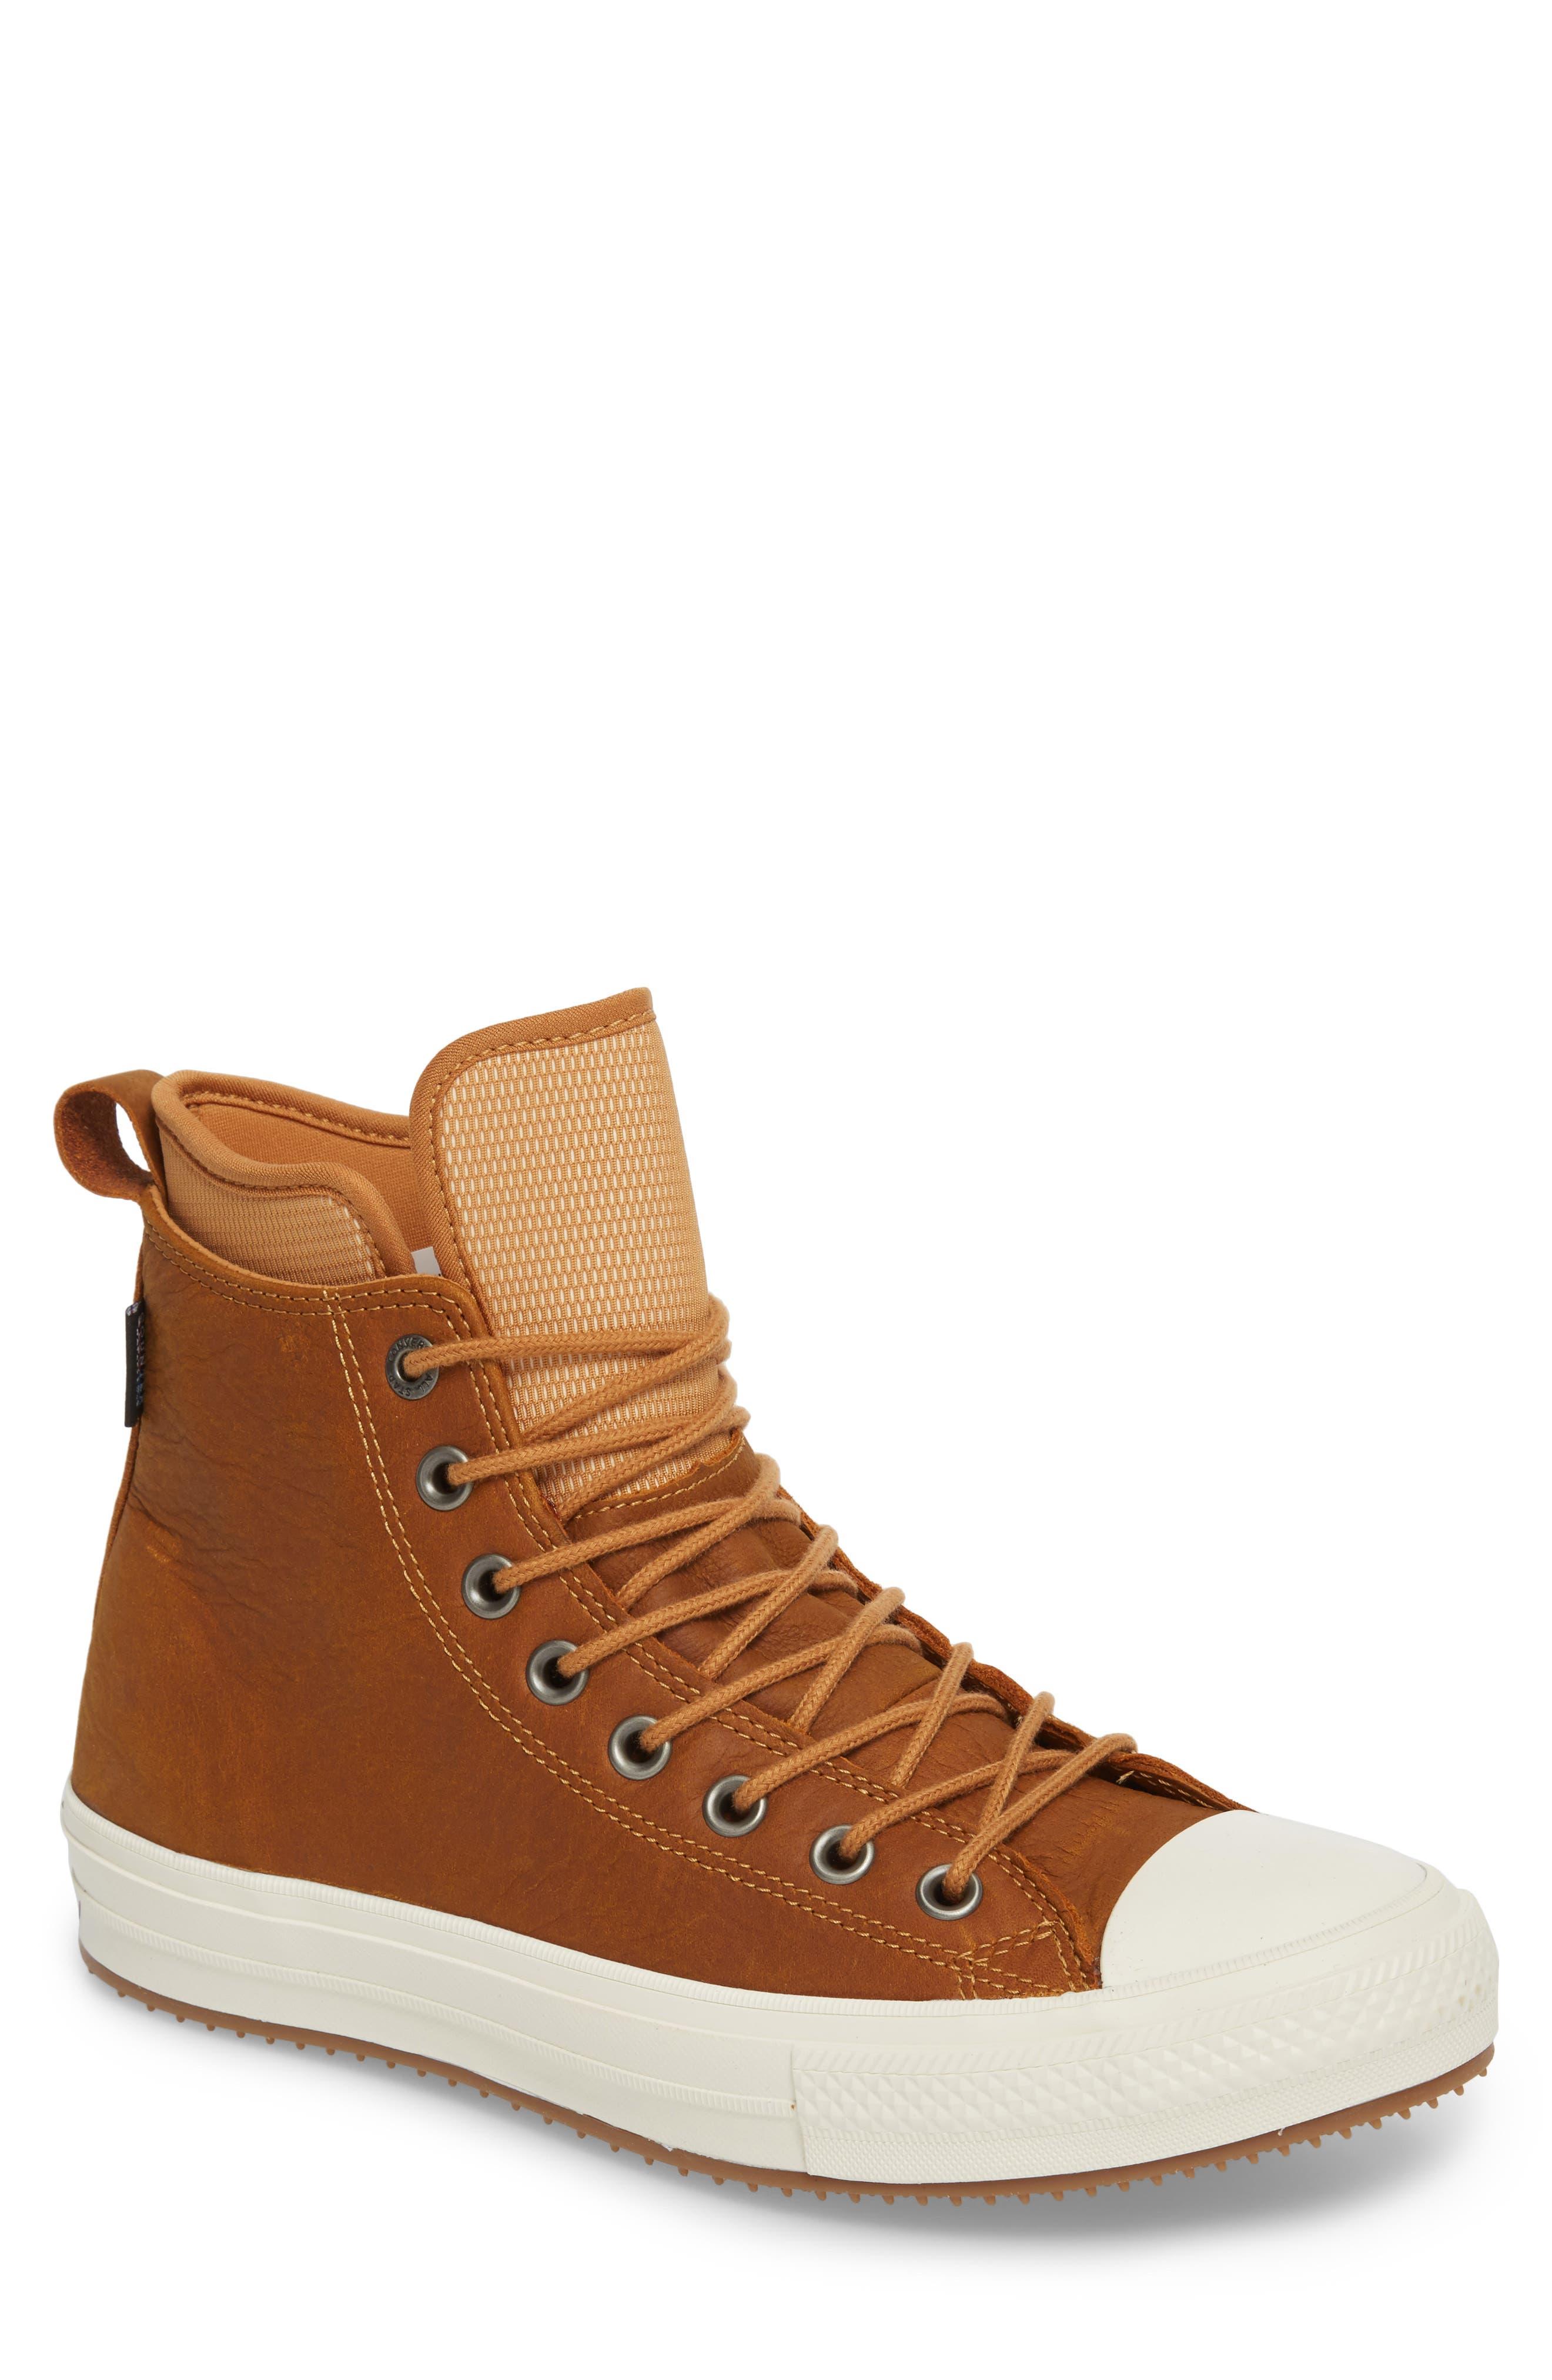 Chuck Taylor<sup>®</sup> All Star<sup>®</sup> Waterproof Sneaker,                             Main thumbnail 1, color,                             237